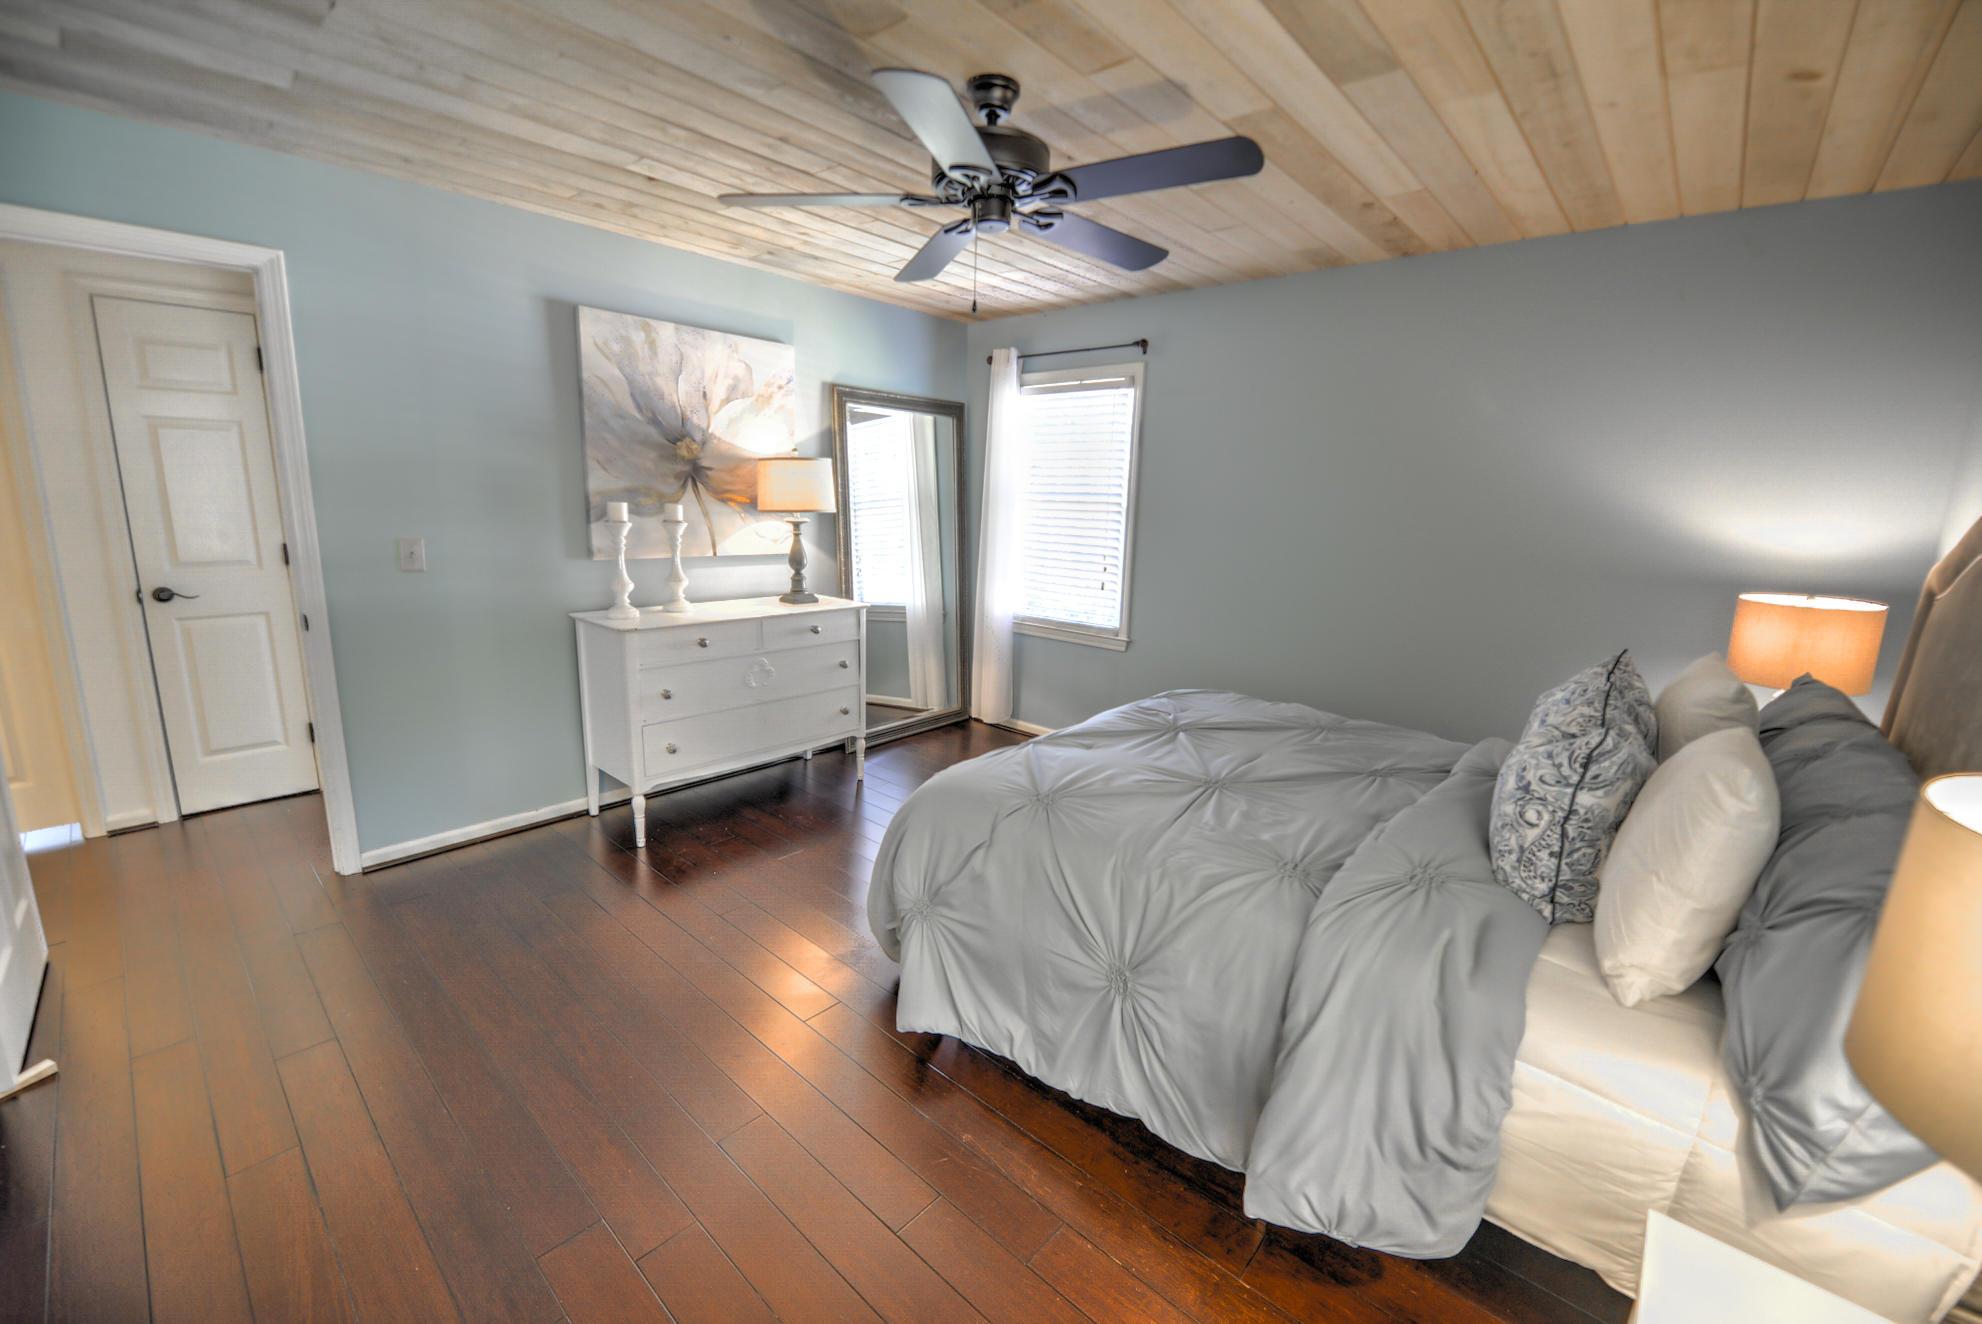 Shemwood II Homes For Sale - 1017 Jack Snipe, Mount Pleasant, SC - 20